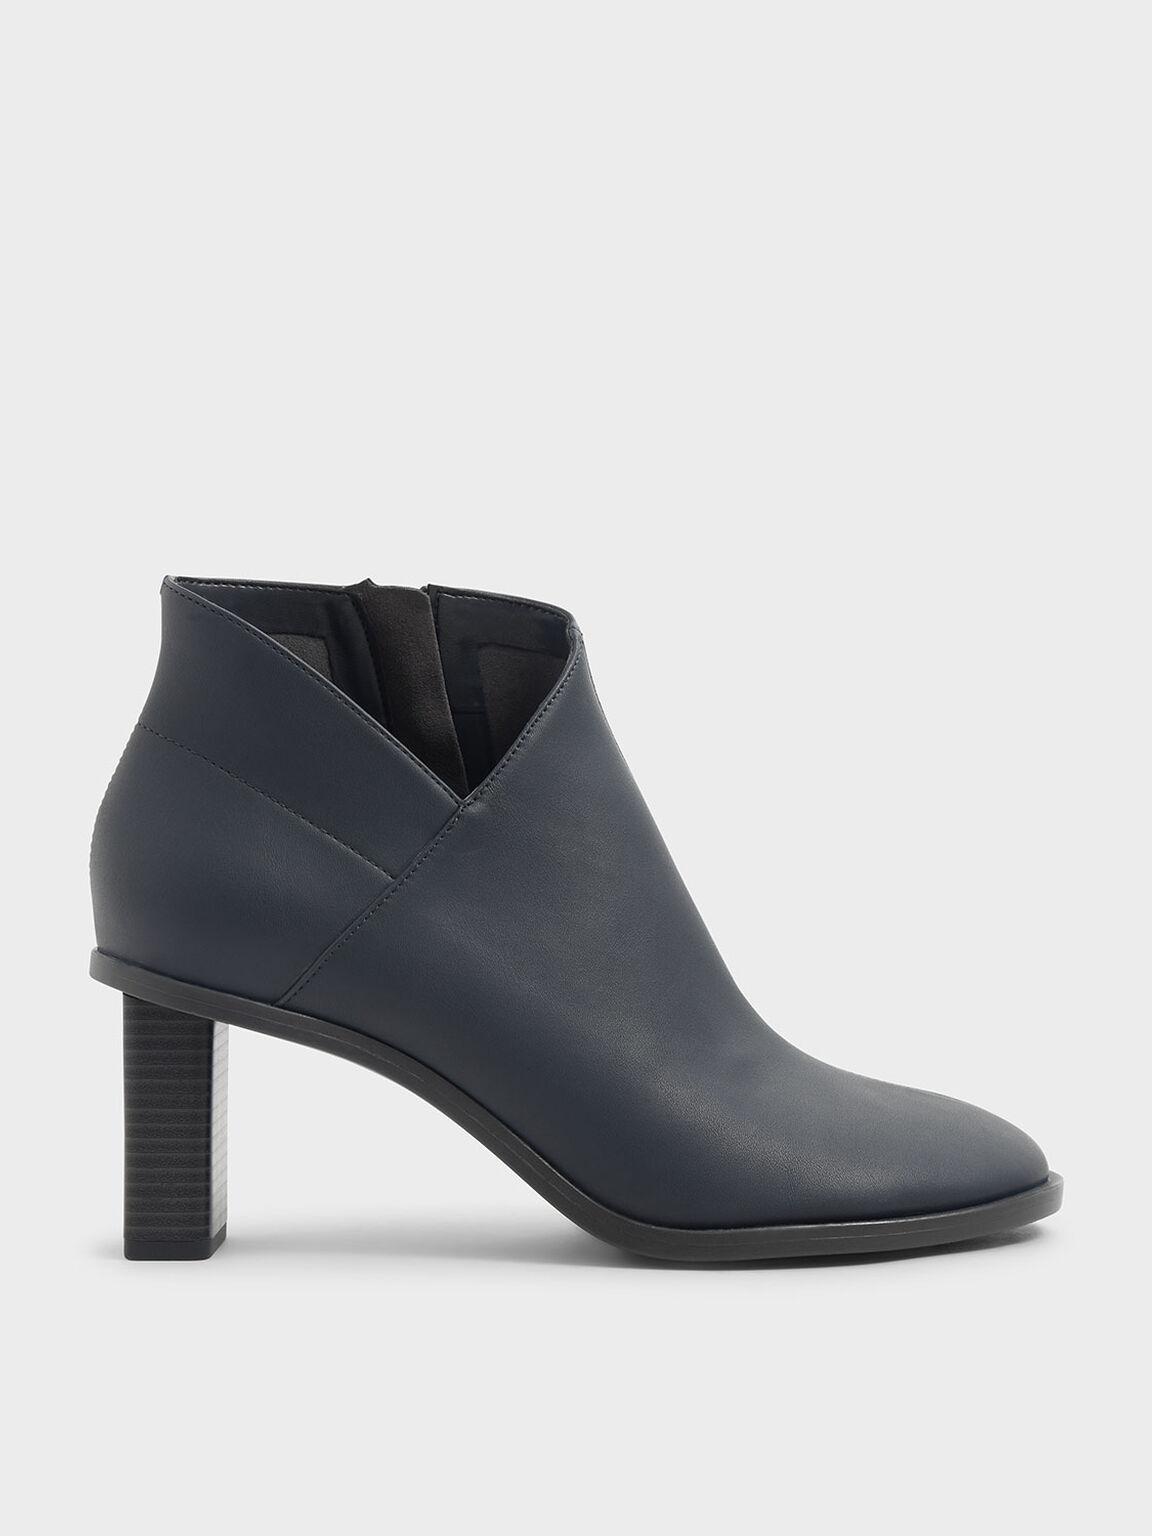 Stitch Trim Ankle Boots, Grey, hi-res